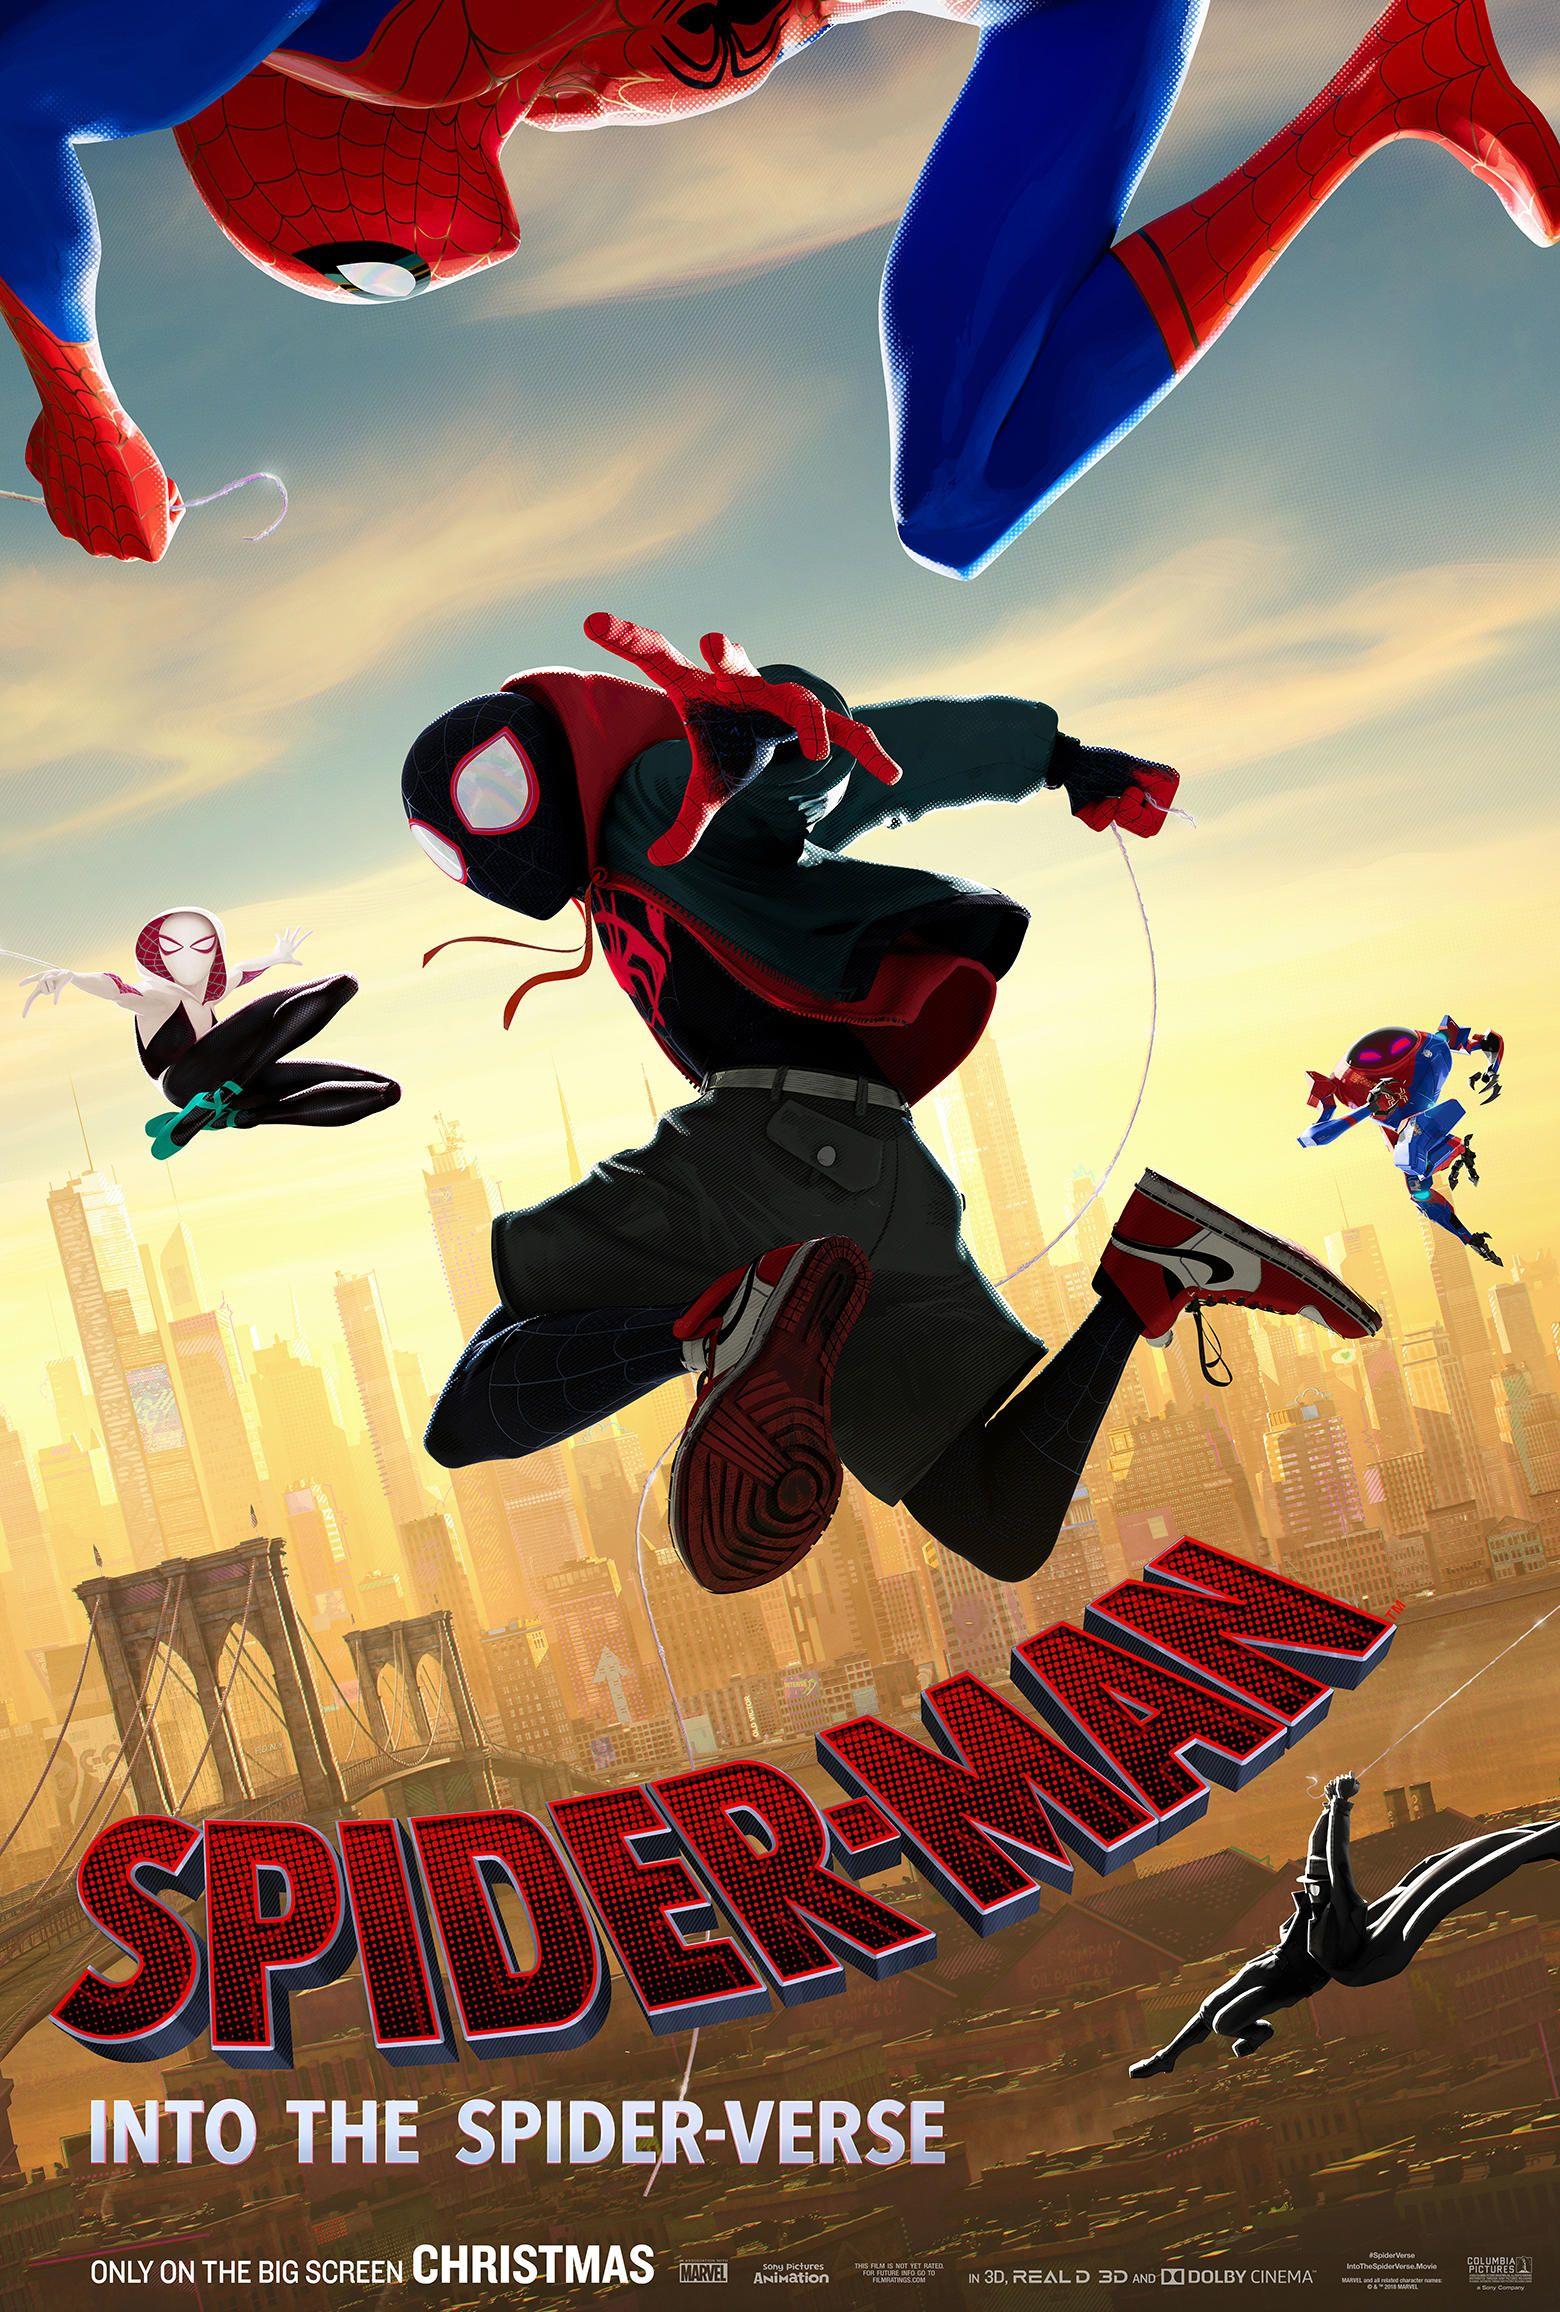 Pin By Marvel Entertainment On Fandom Spider Man Pinterest